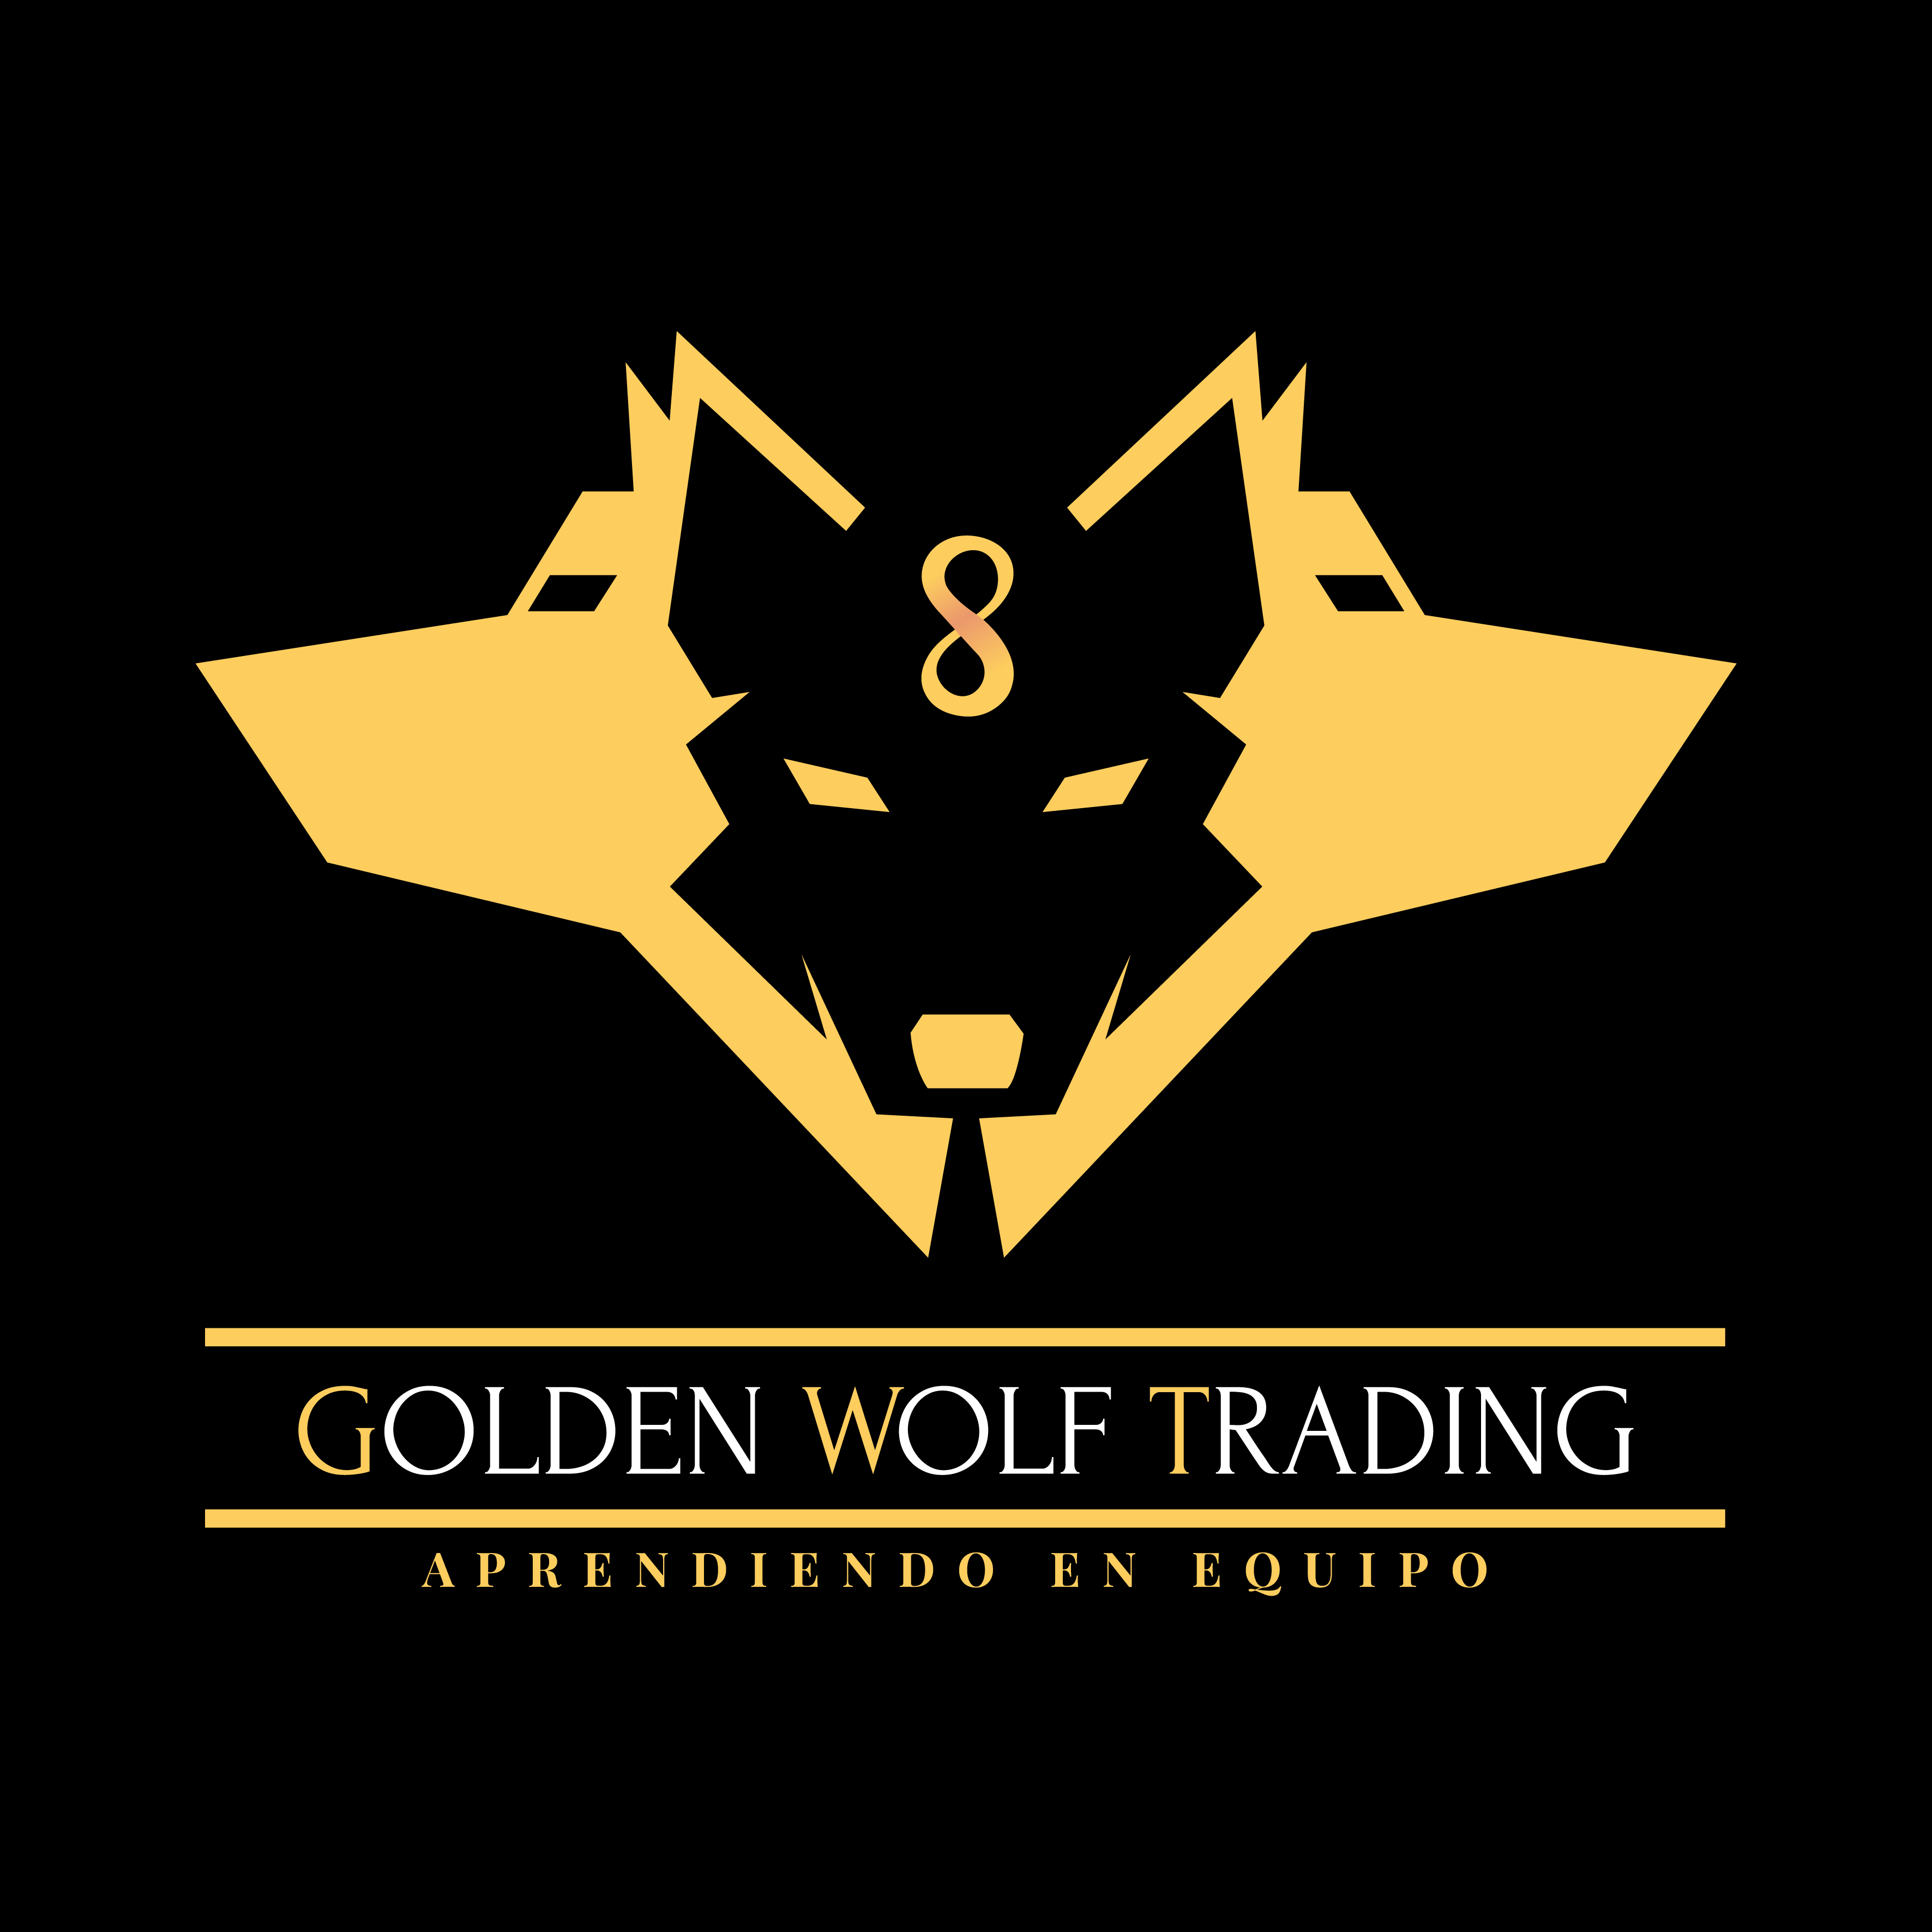 Golden Wolf Trading